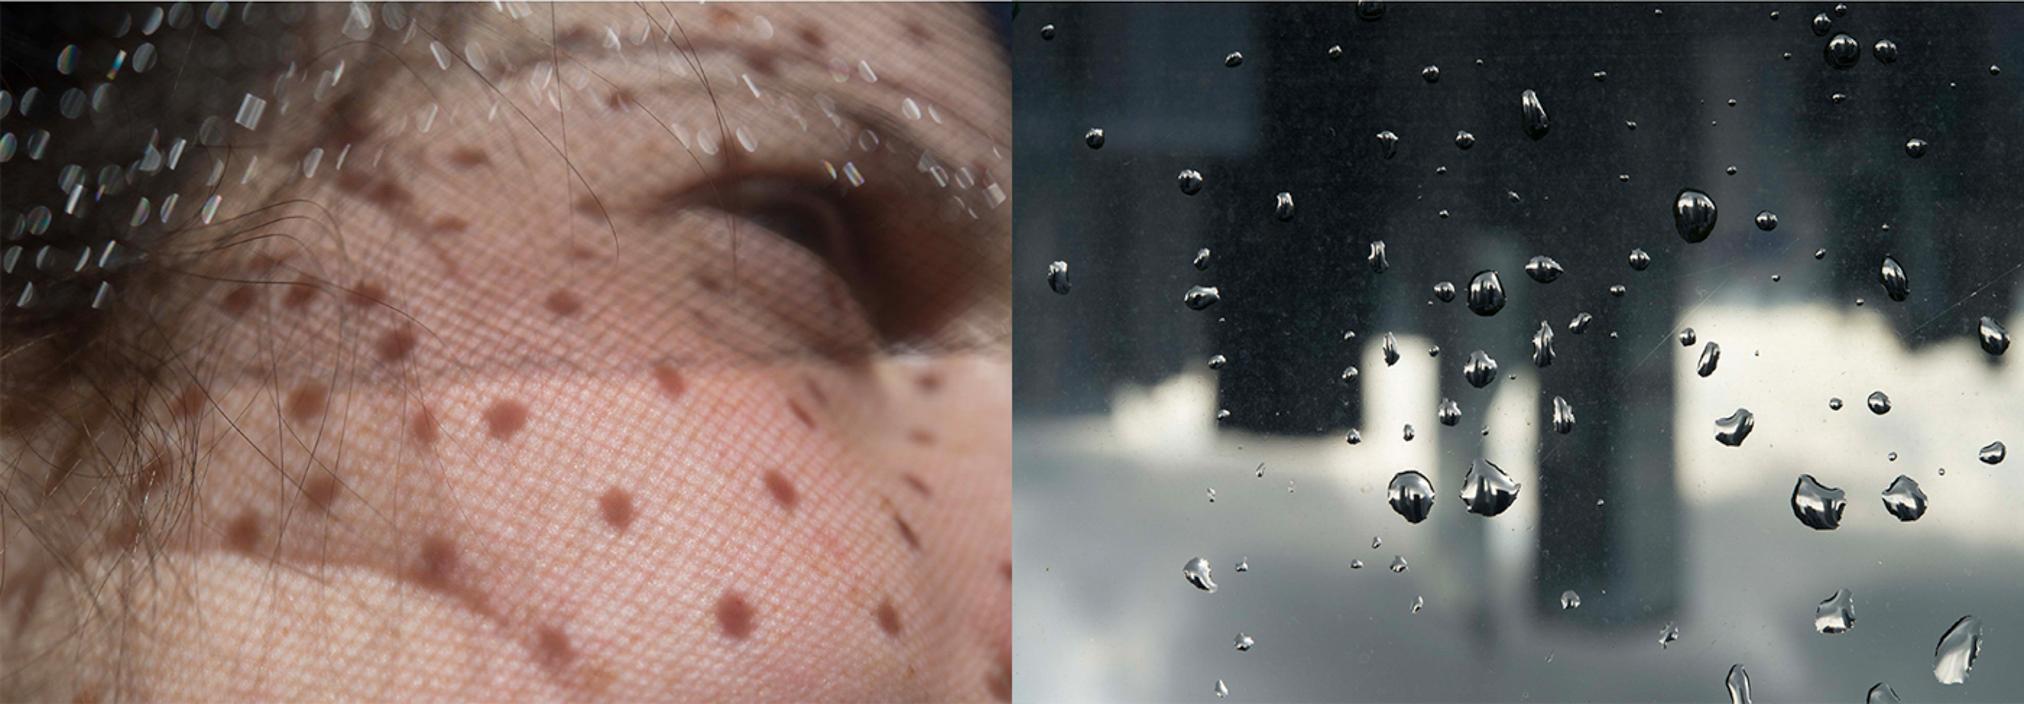 SunDrops-RainDrops.jpg